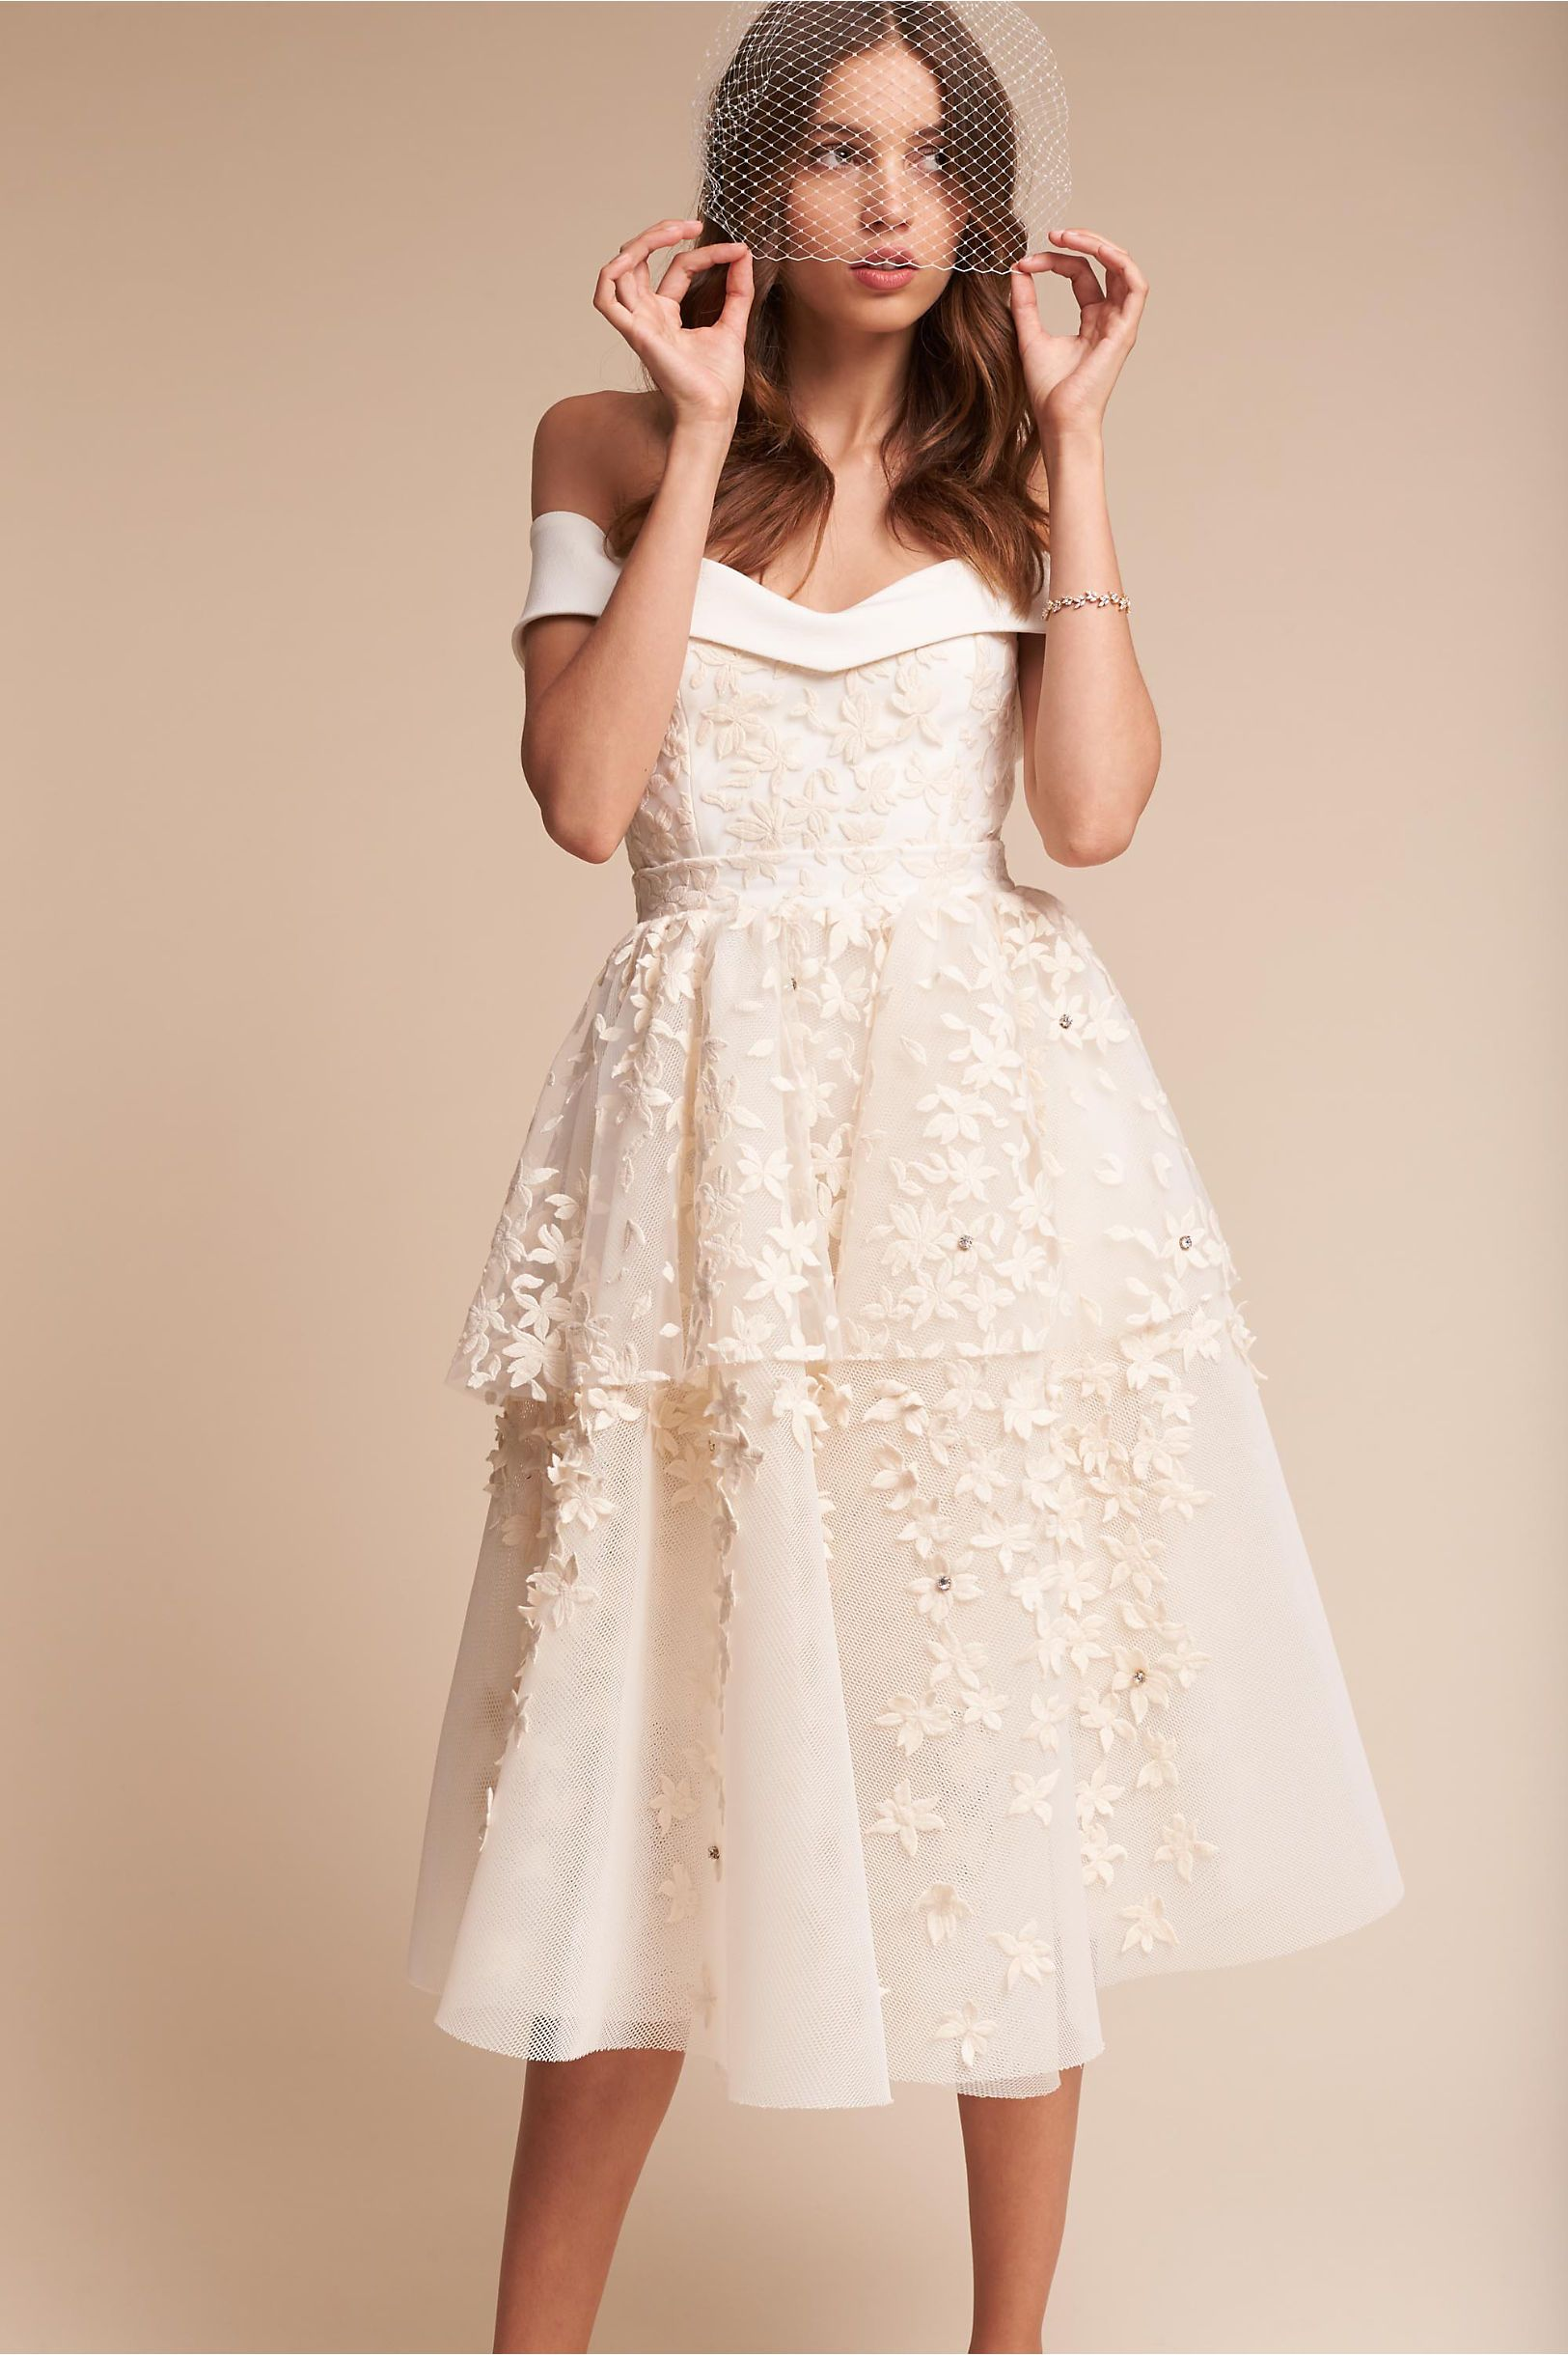 White short wedding dresses  BHLDNus Emerson Gown in Champagne  Emerson Bhldn and Gowns